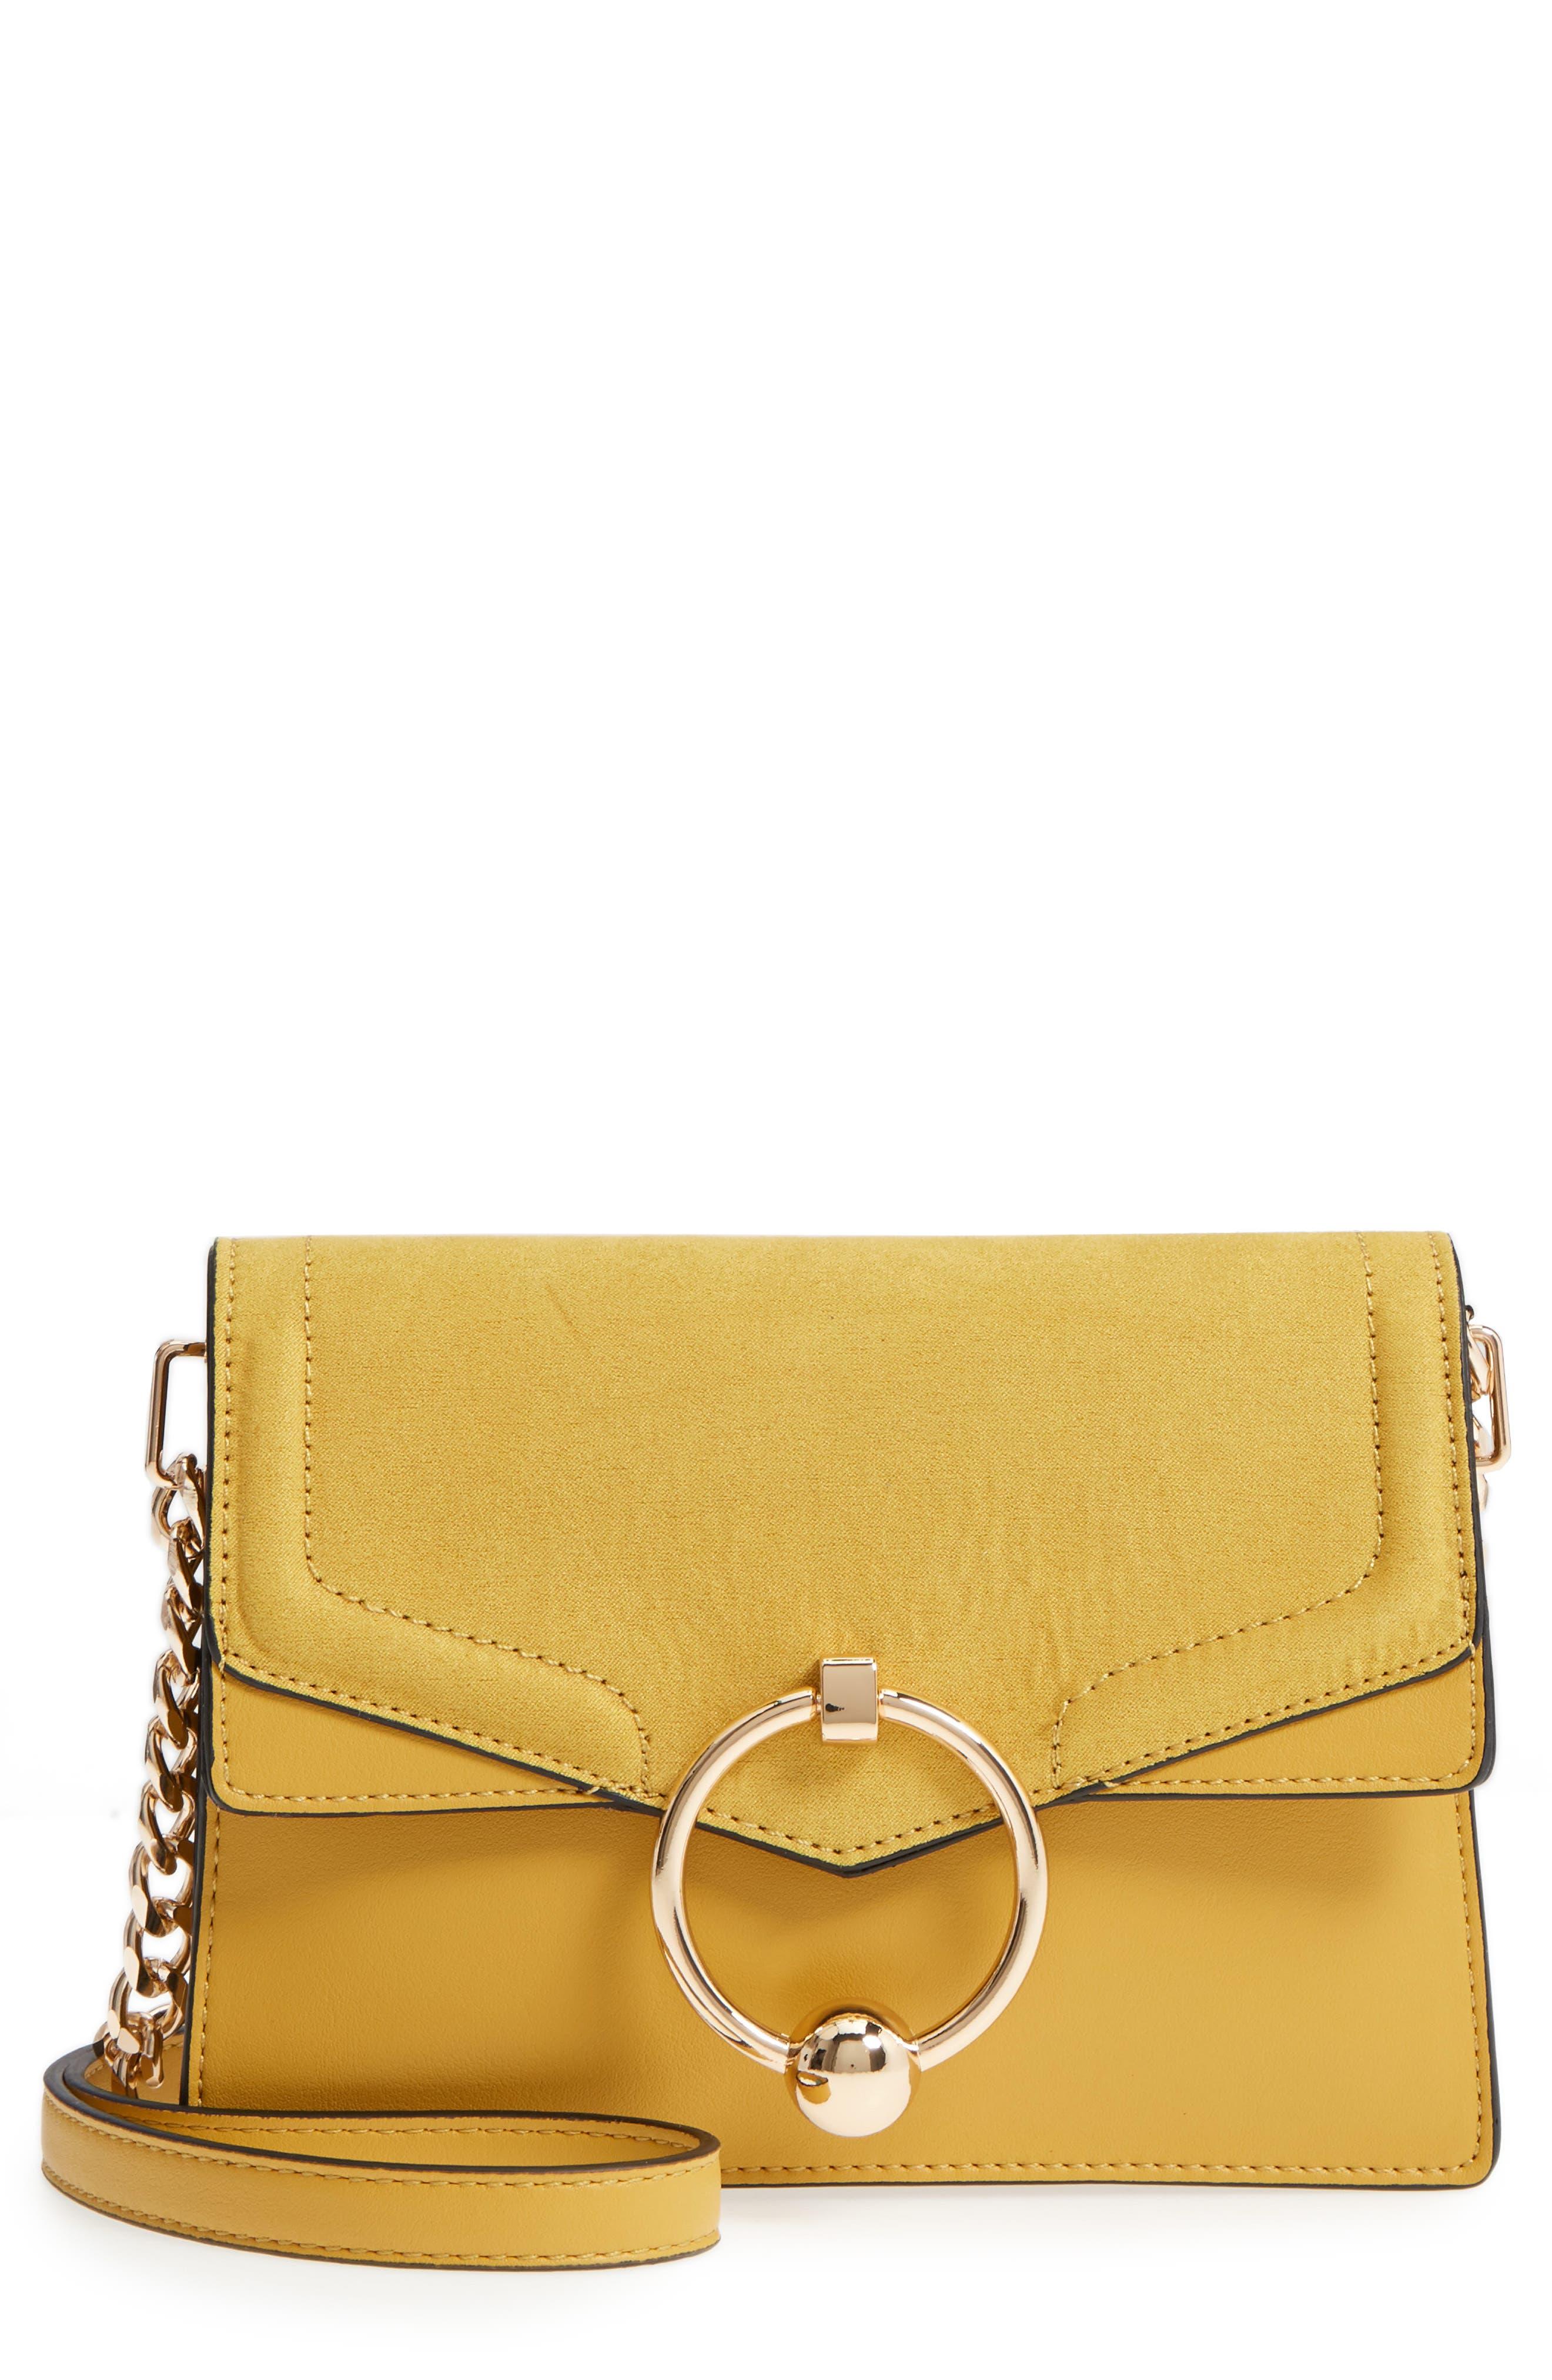 Seline Faux Leather Crossbody Bag,                             Main thumbnail 1, color,                             Yellow Multi